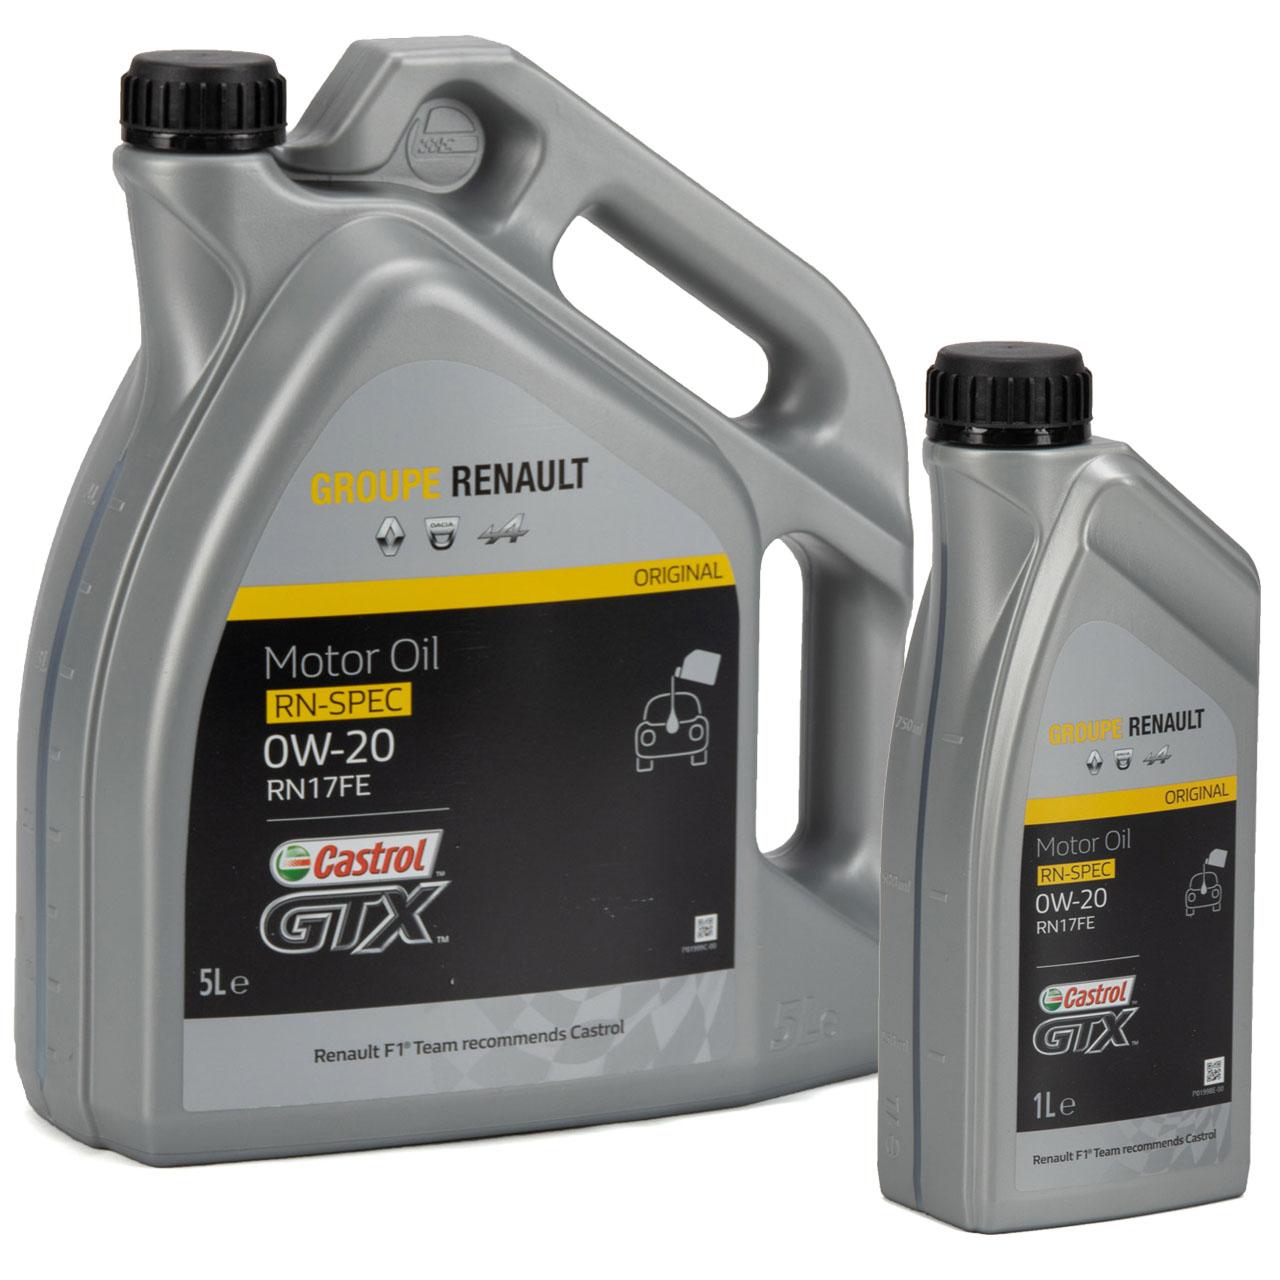 CASTROL Motoröl Öl GTX RN-SPEC 0W-20 0W20 für Renault RN17FE - 6L 6 Liter